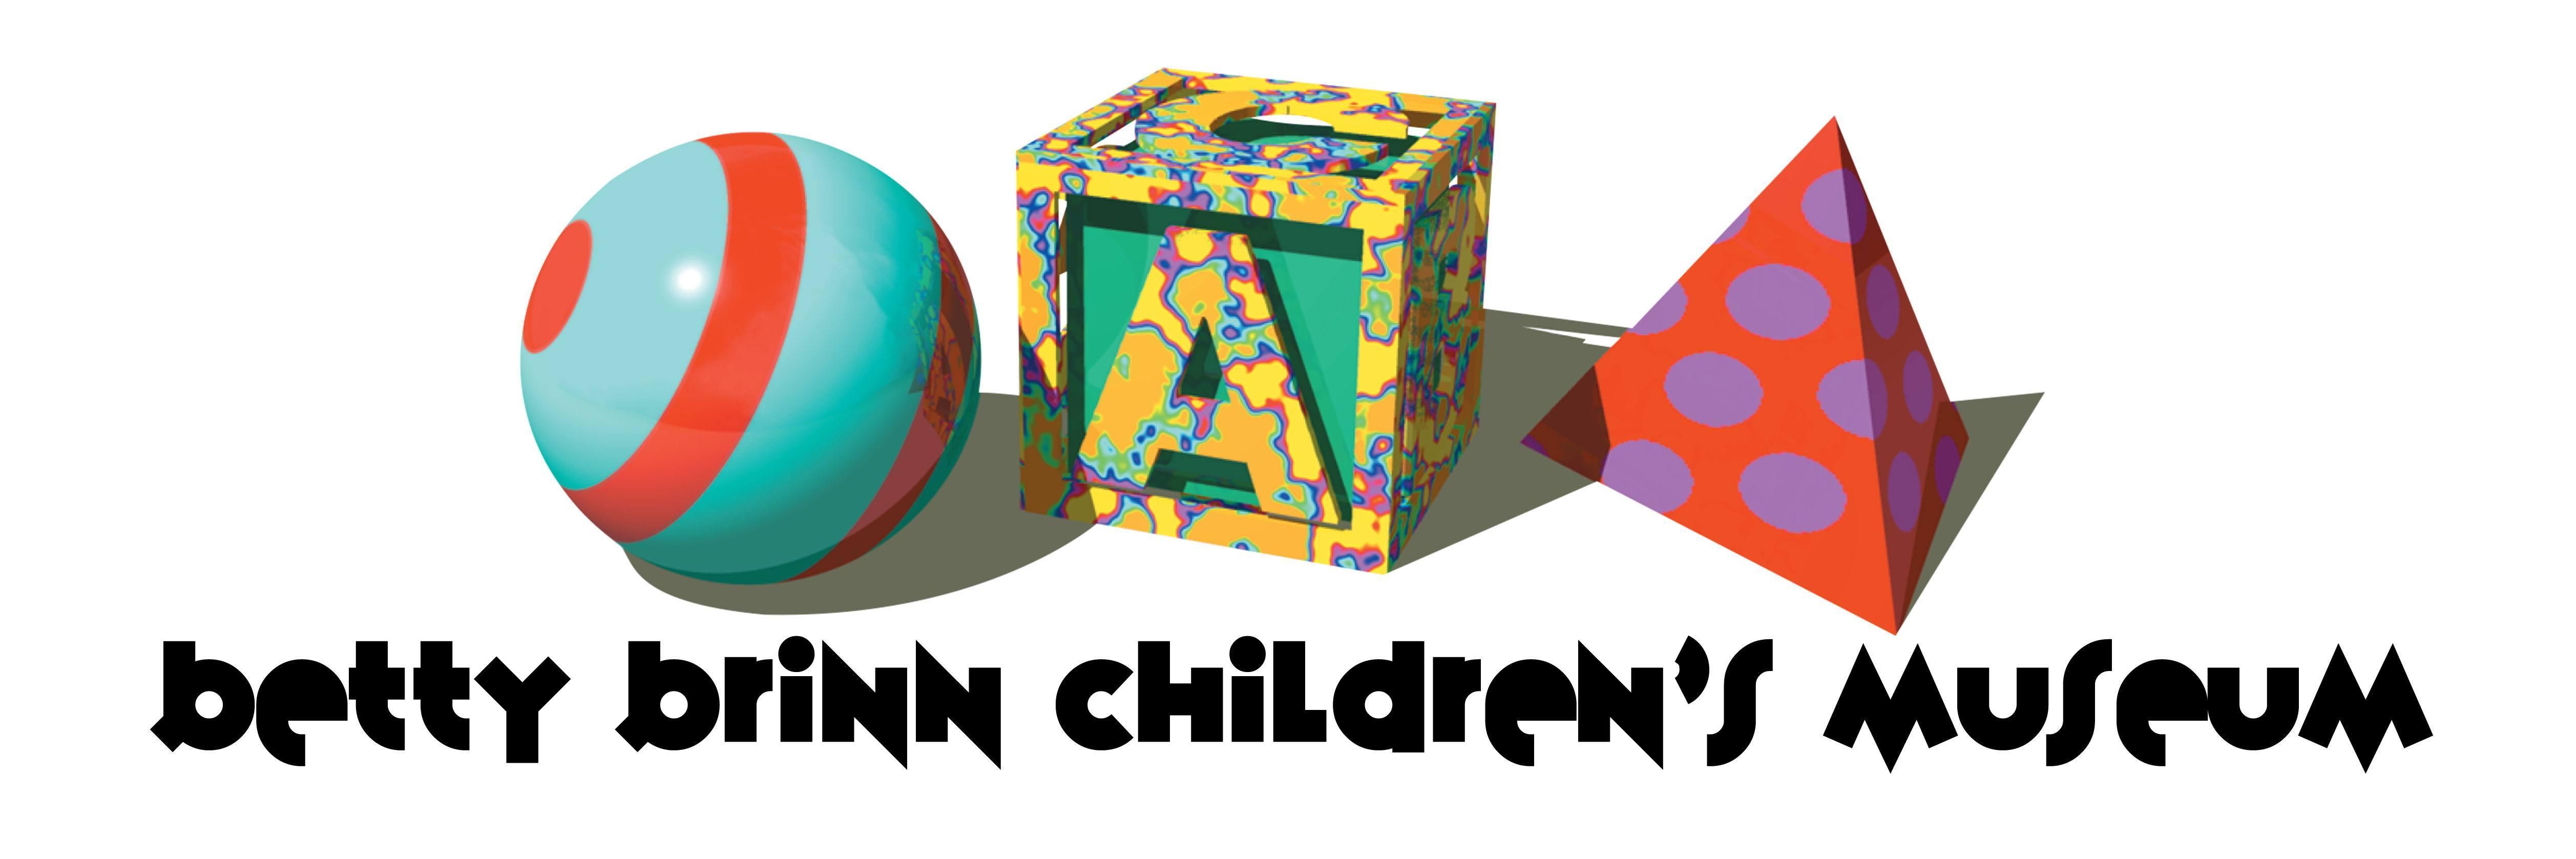 Betty Brinn Children's Museum logo